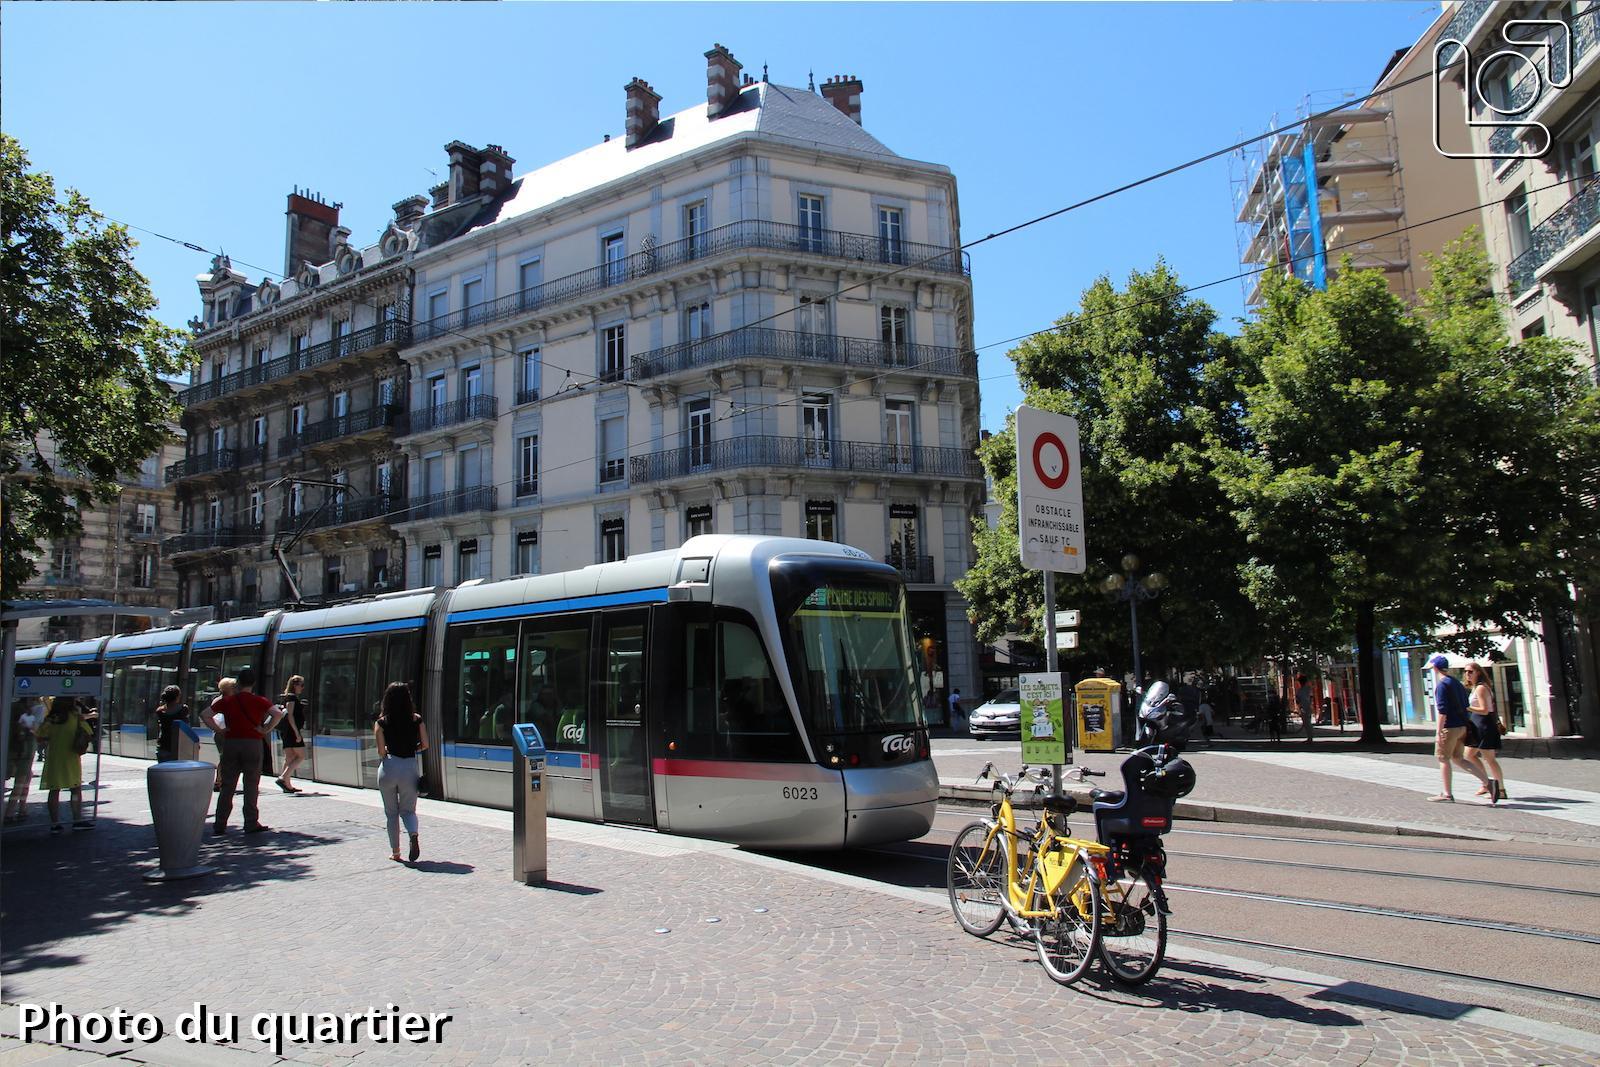 Immobilier quartier centre ville victor hugo grenoble for Piscine clos d or grenoble